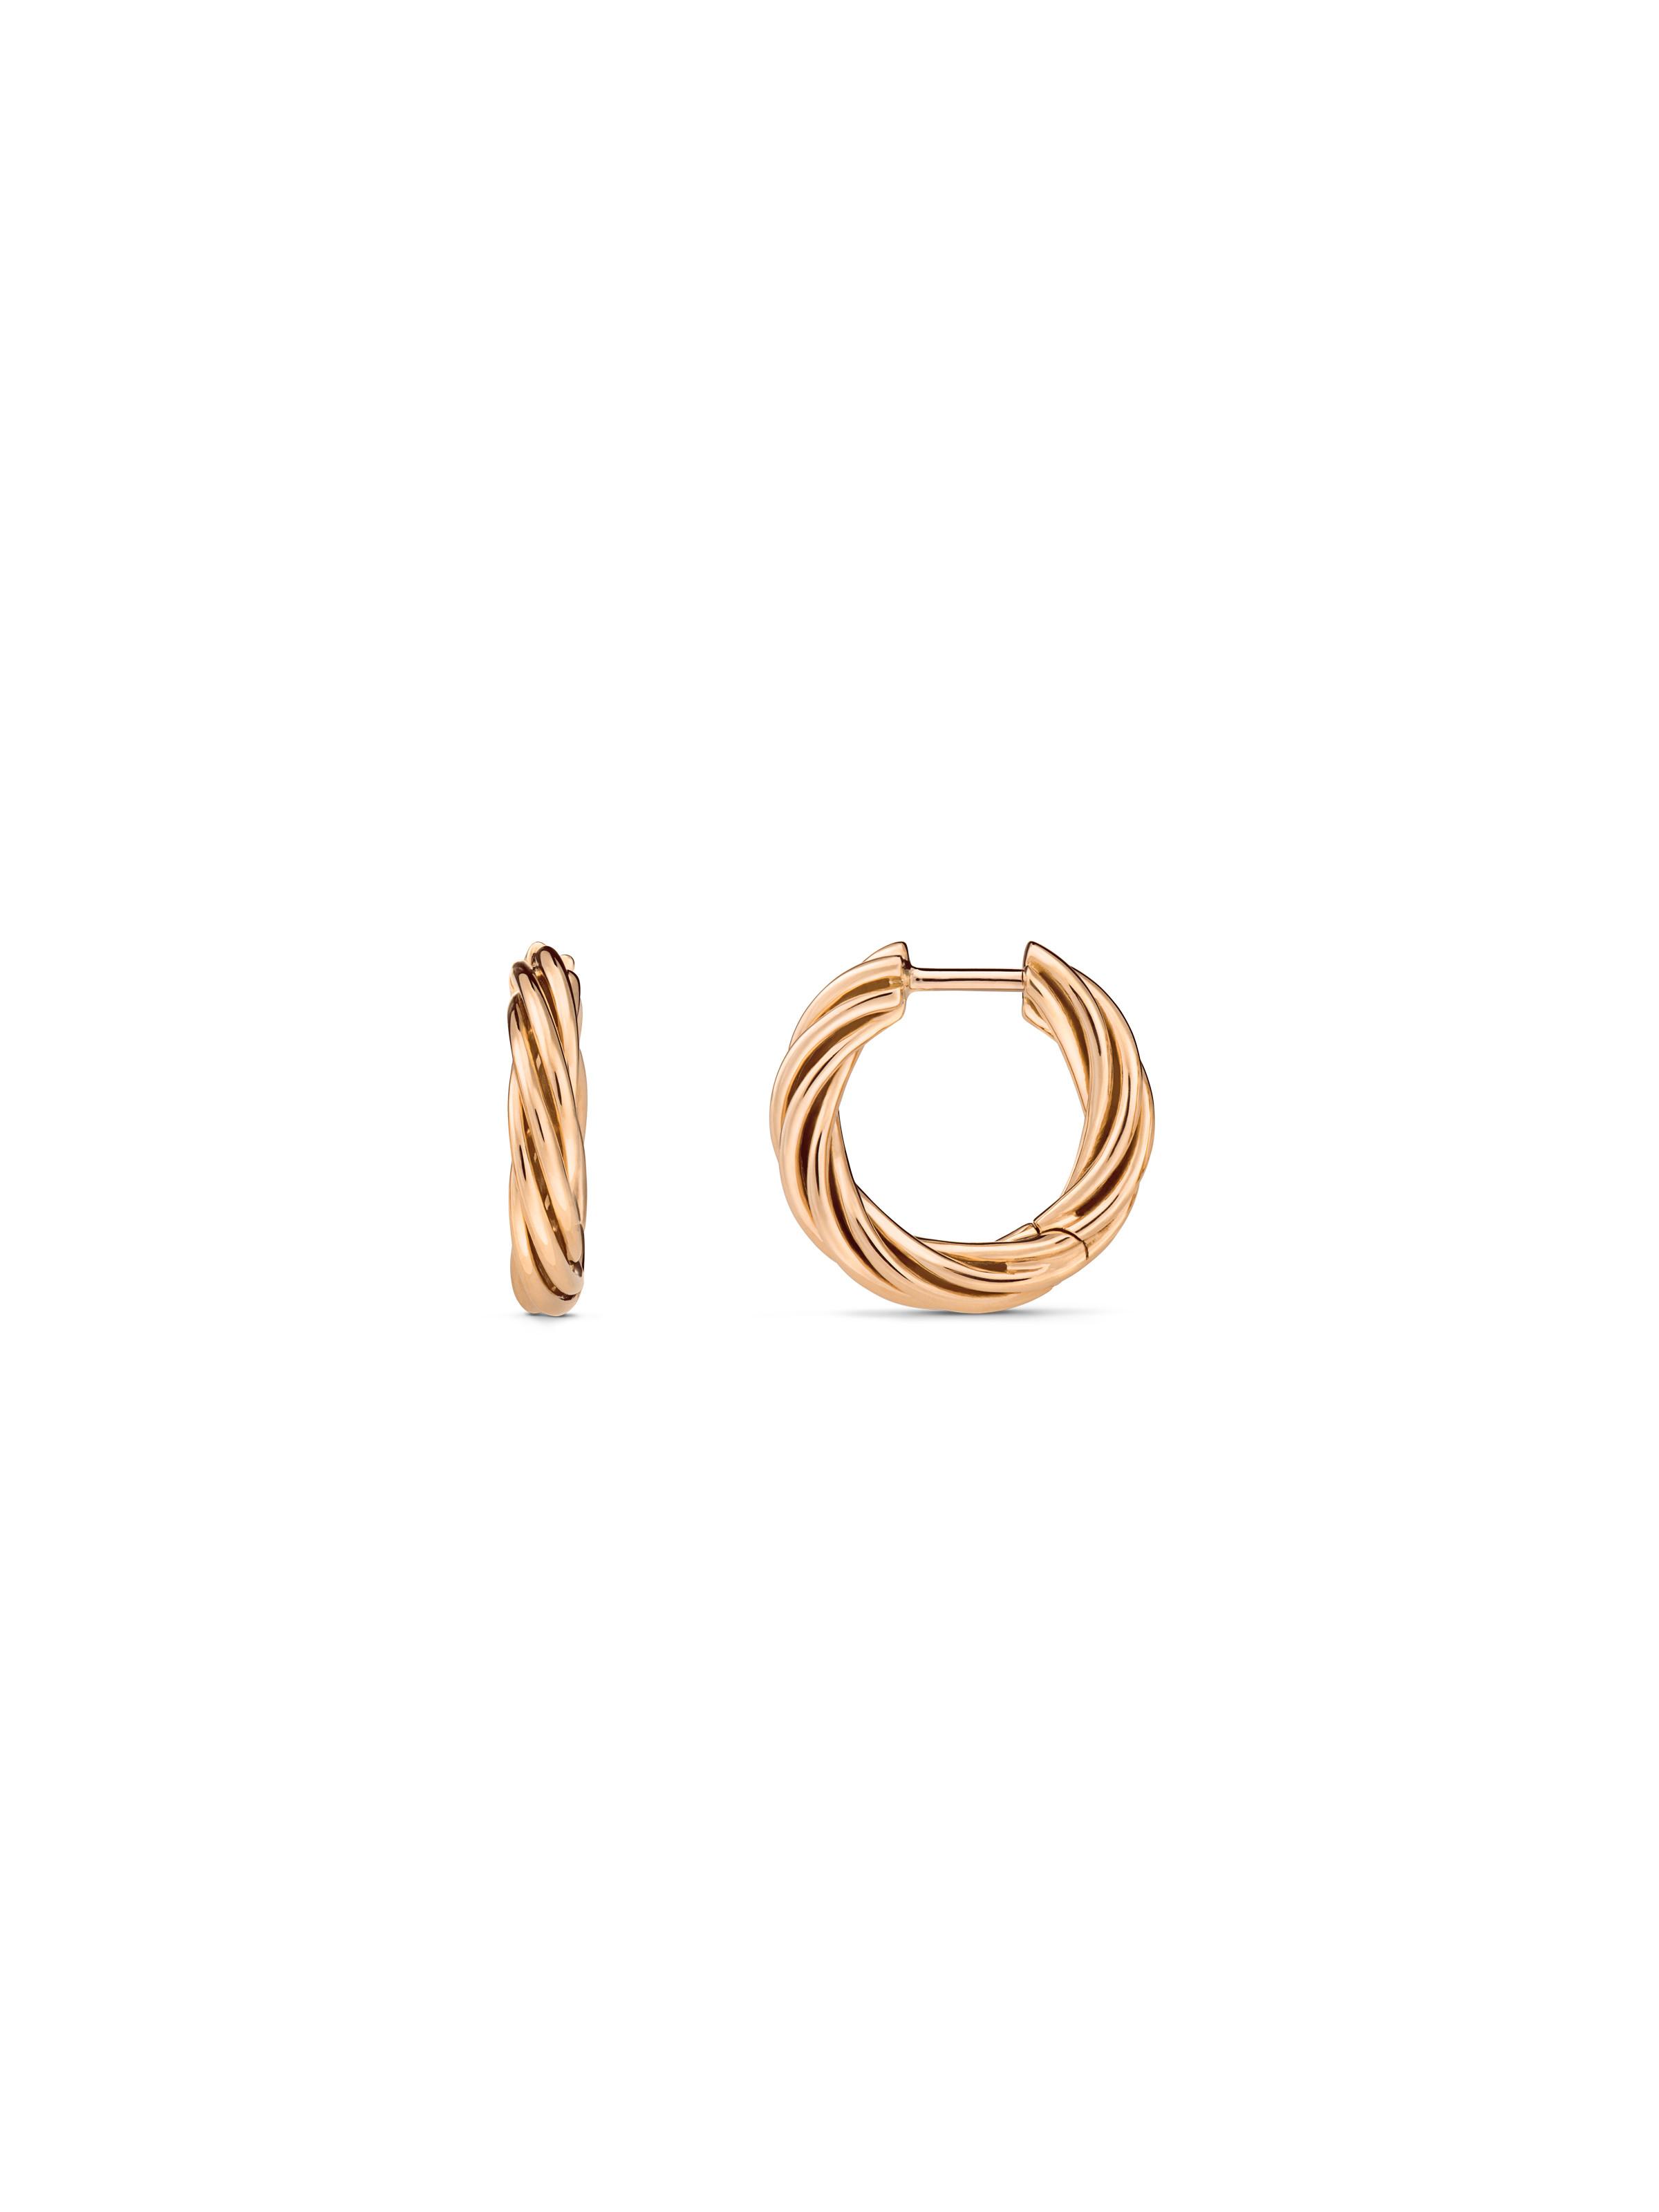 Helioro XS hoop earrings